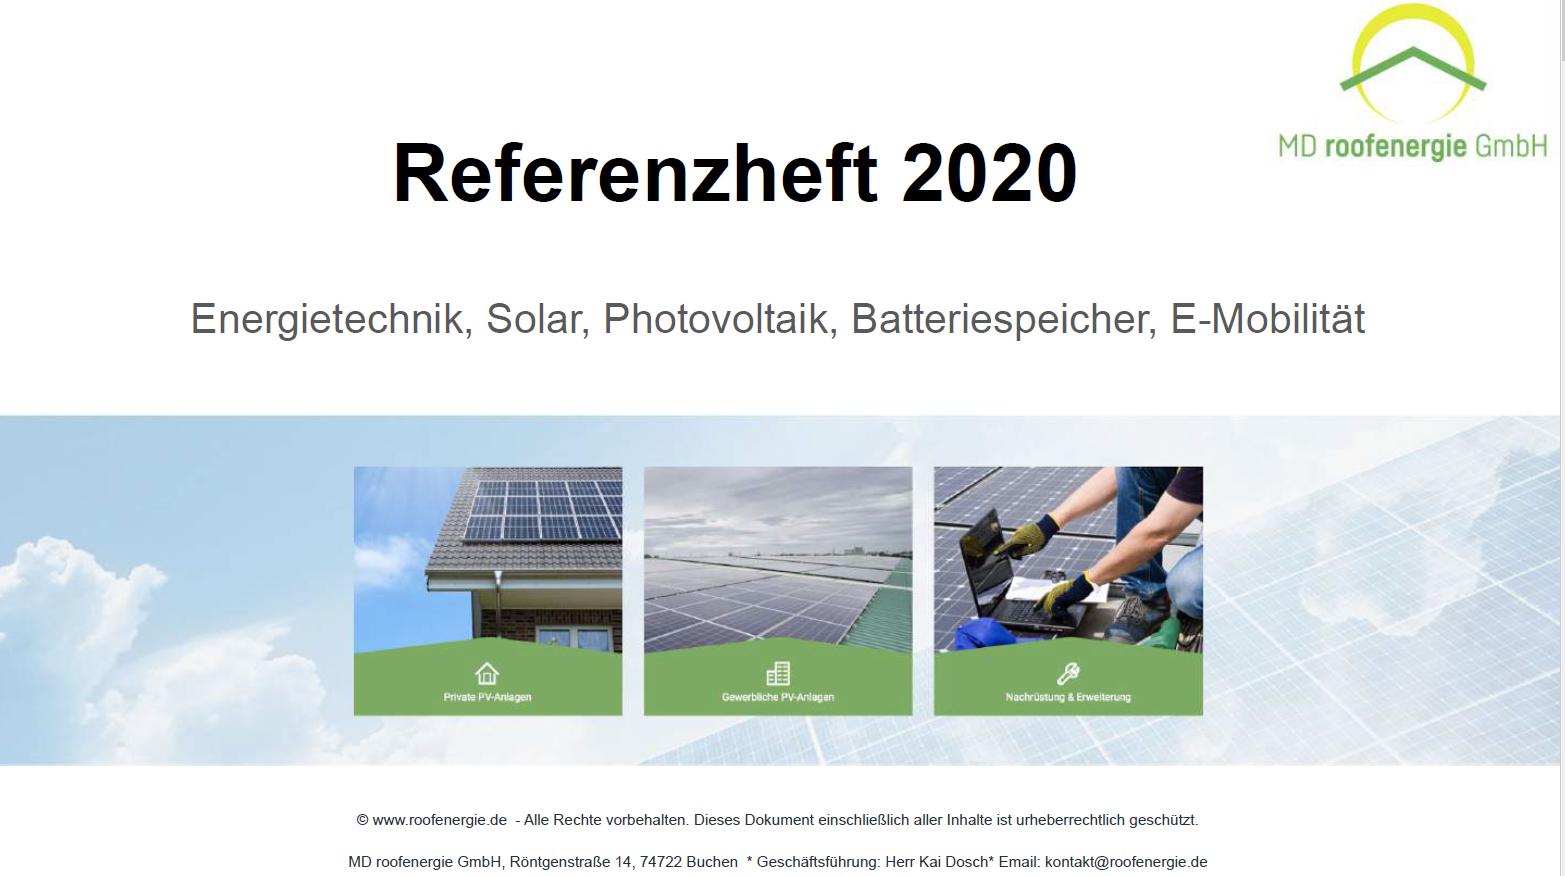 Referenzheft 2020